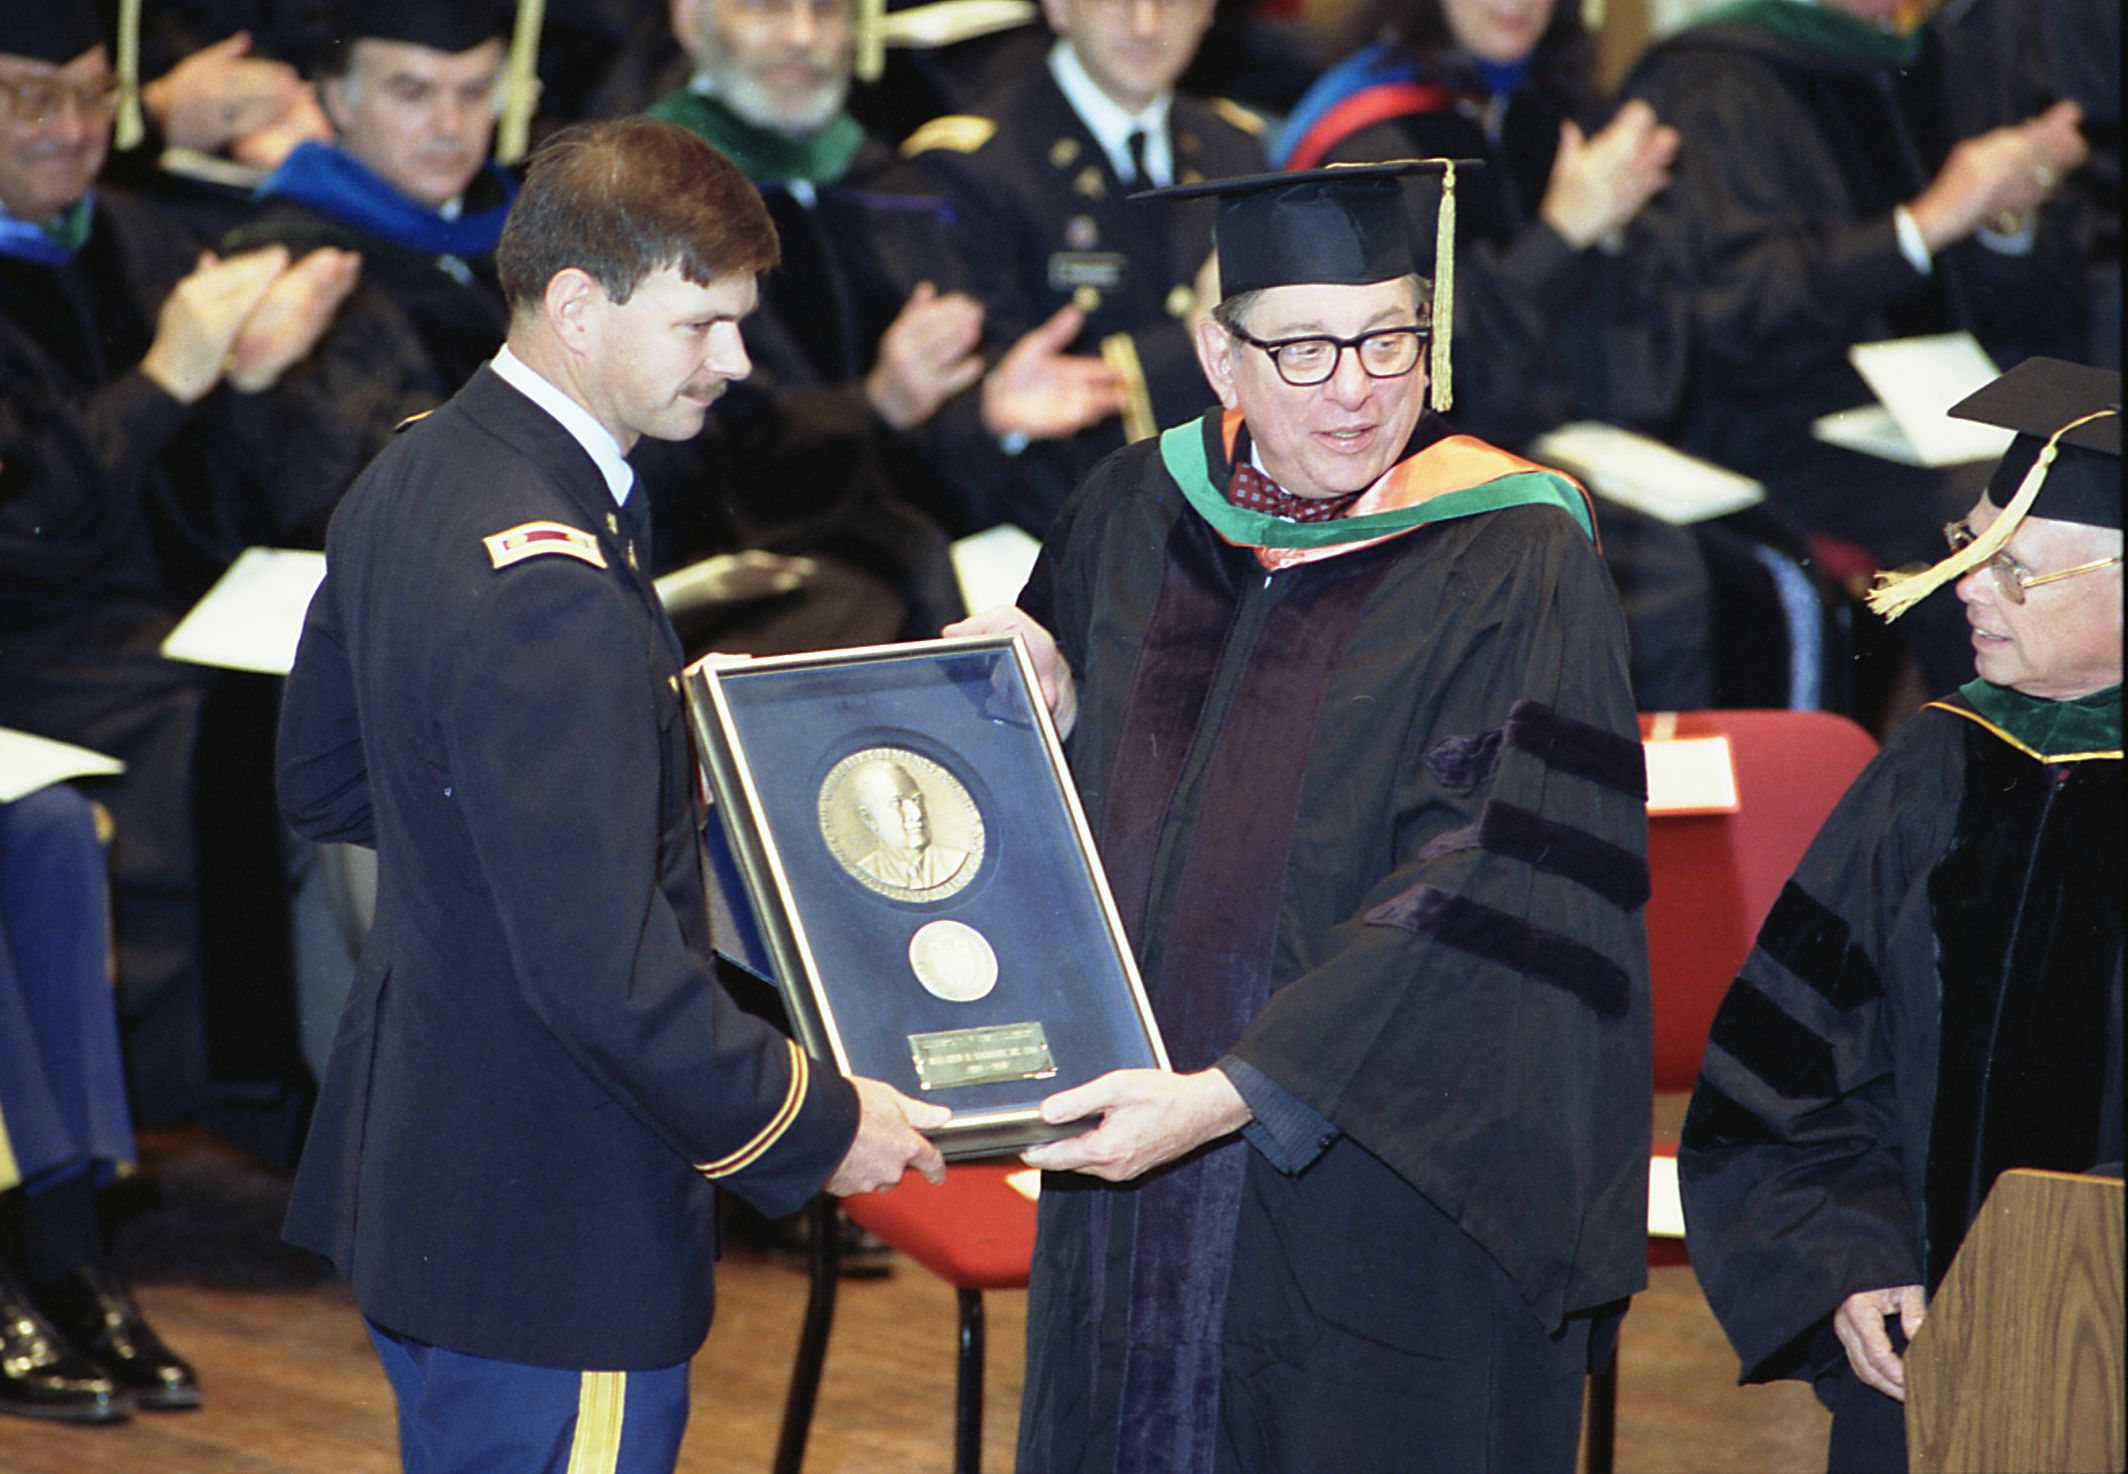 U.S. Army Medical Corps retired Lt. Colonel John Hagmann